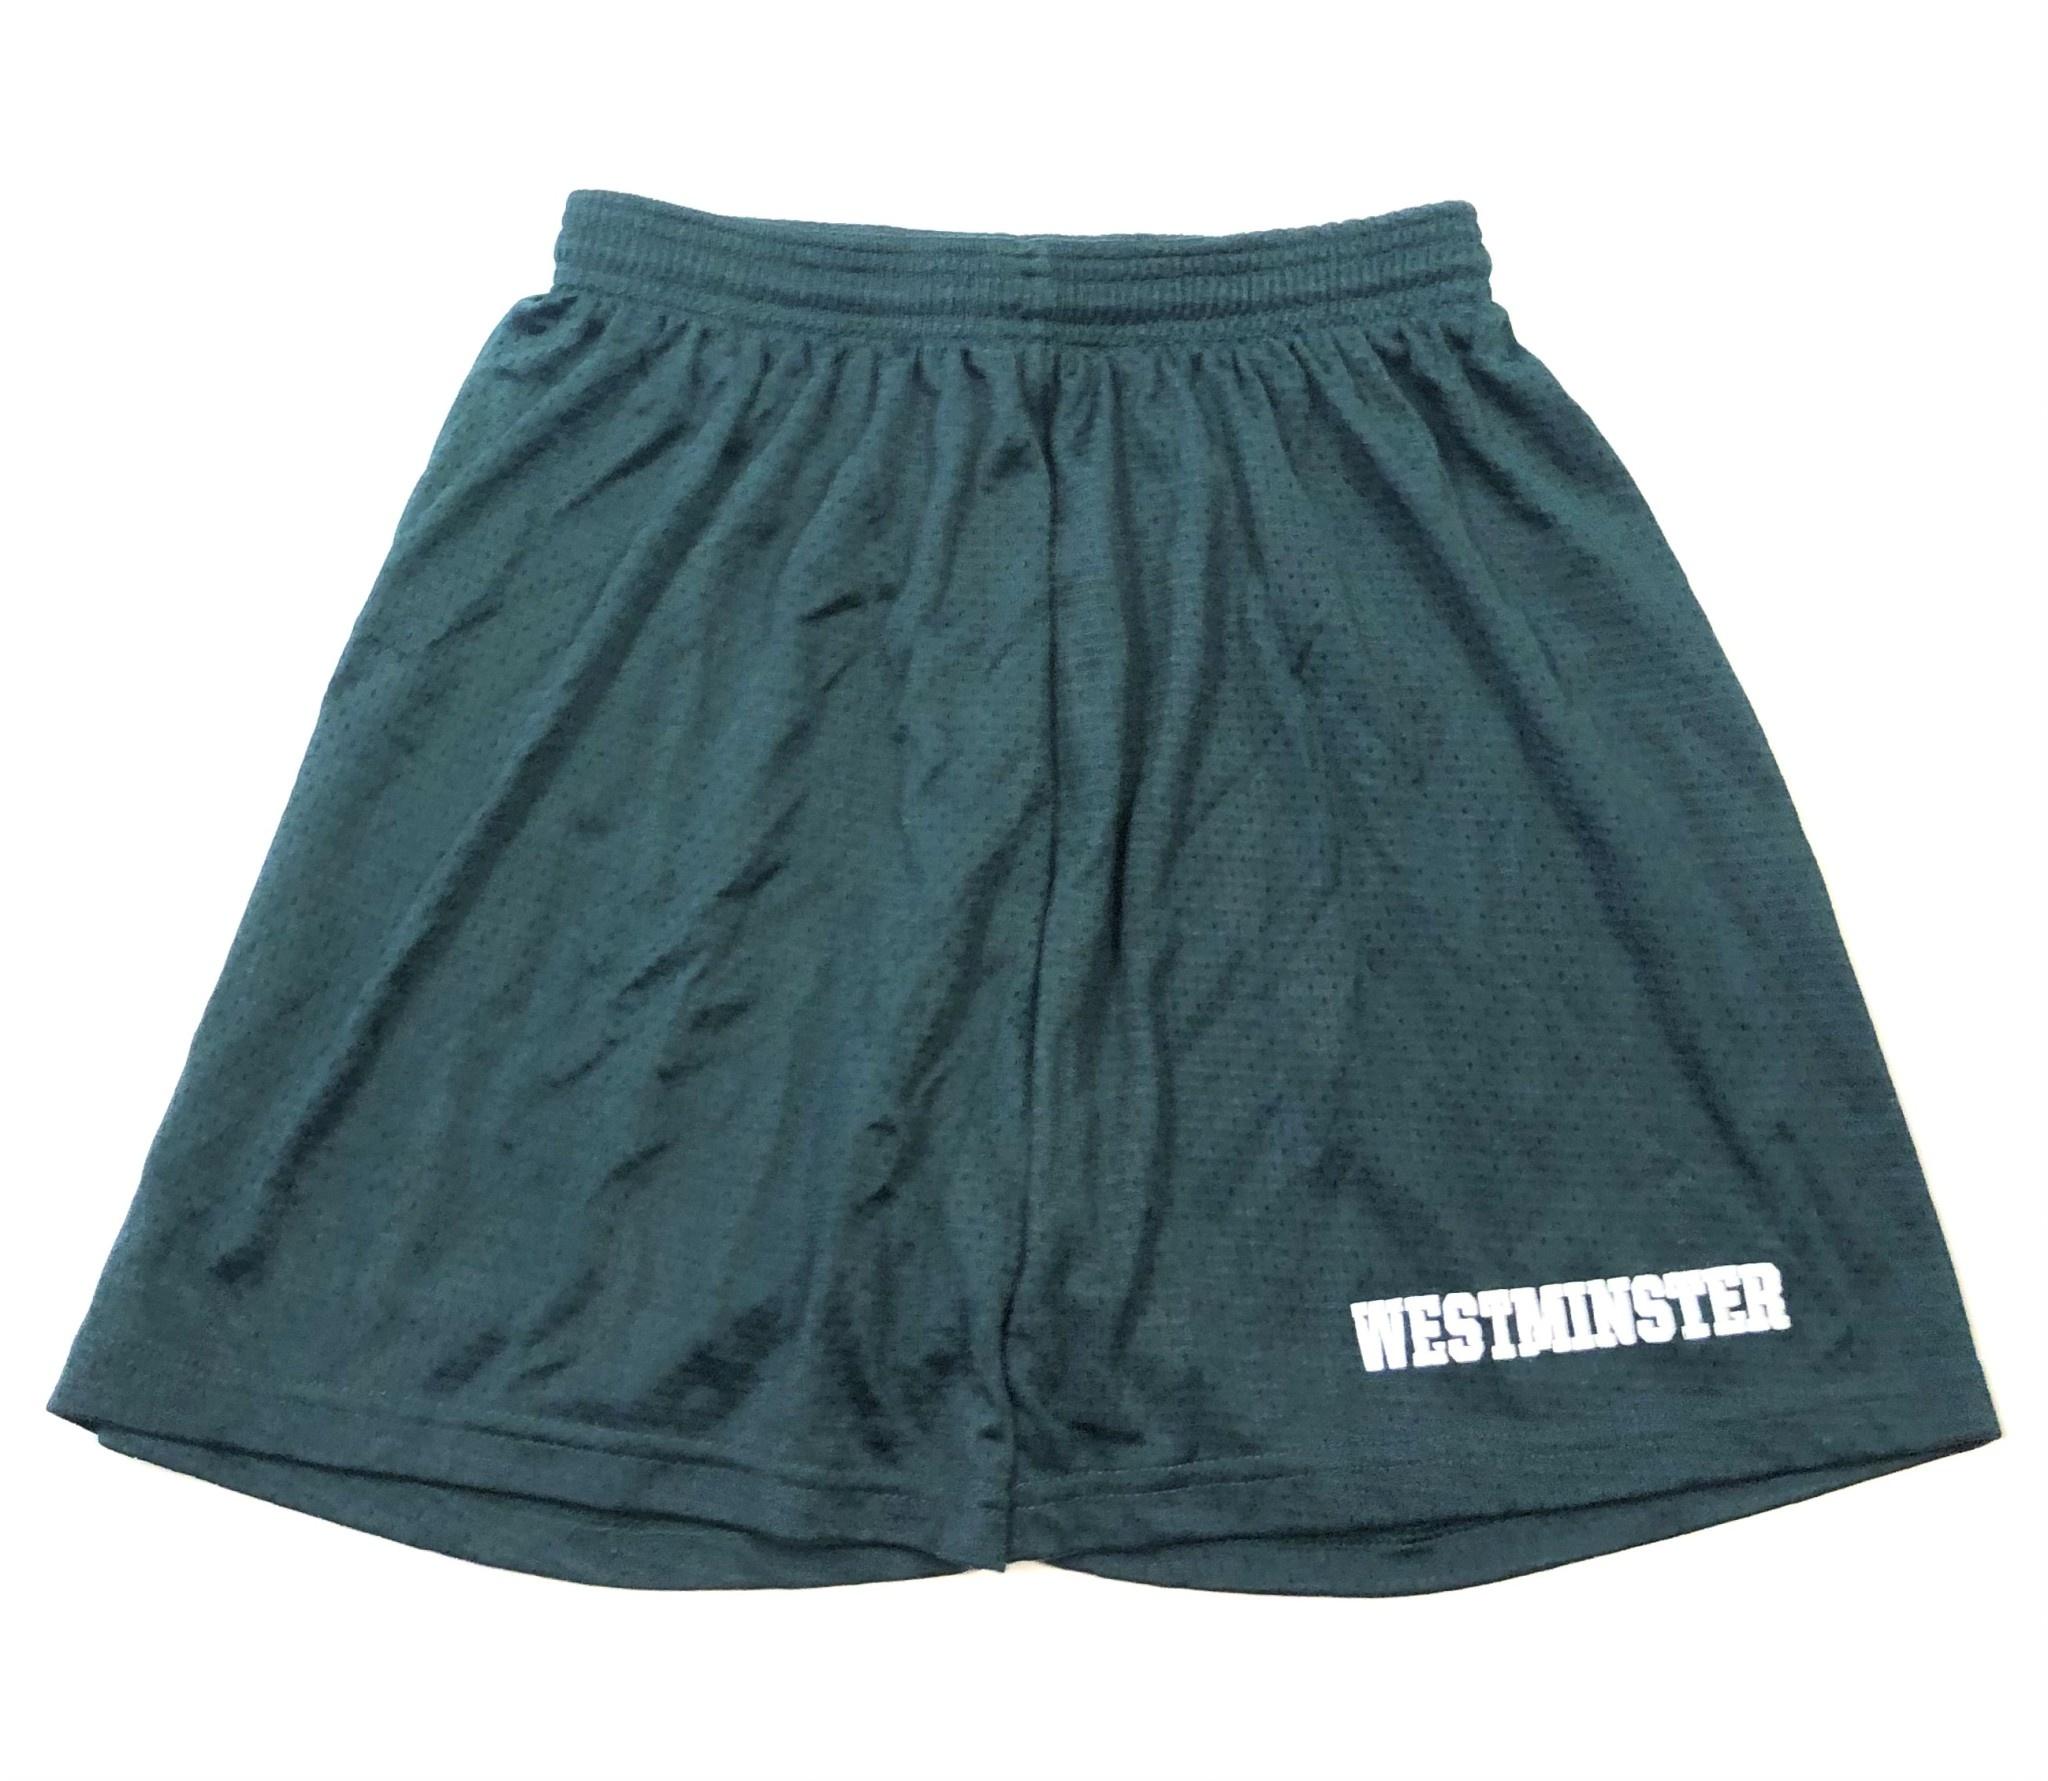 Middle School Ladies PE Shorts